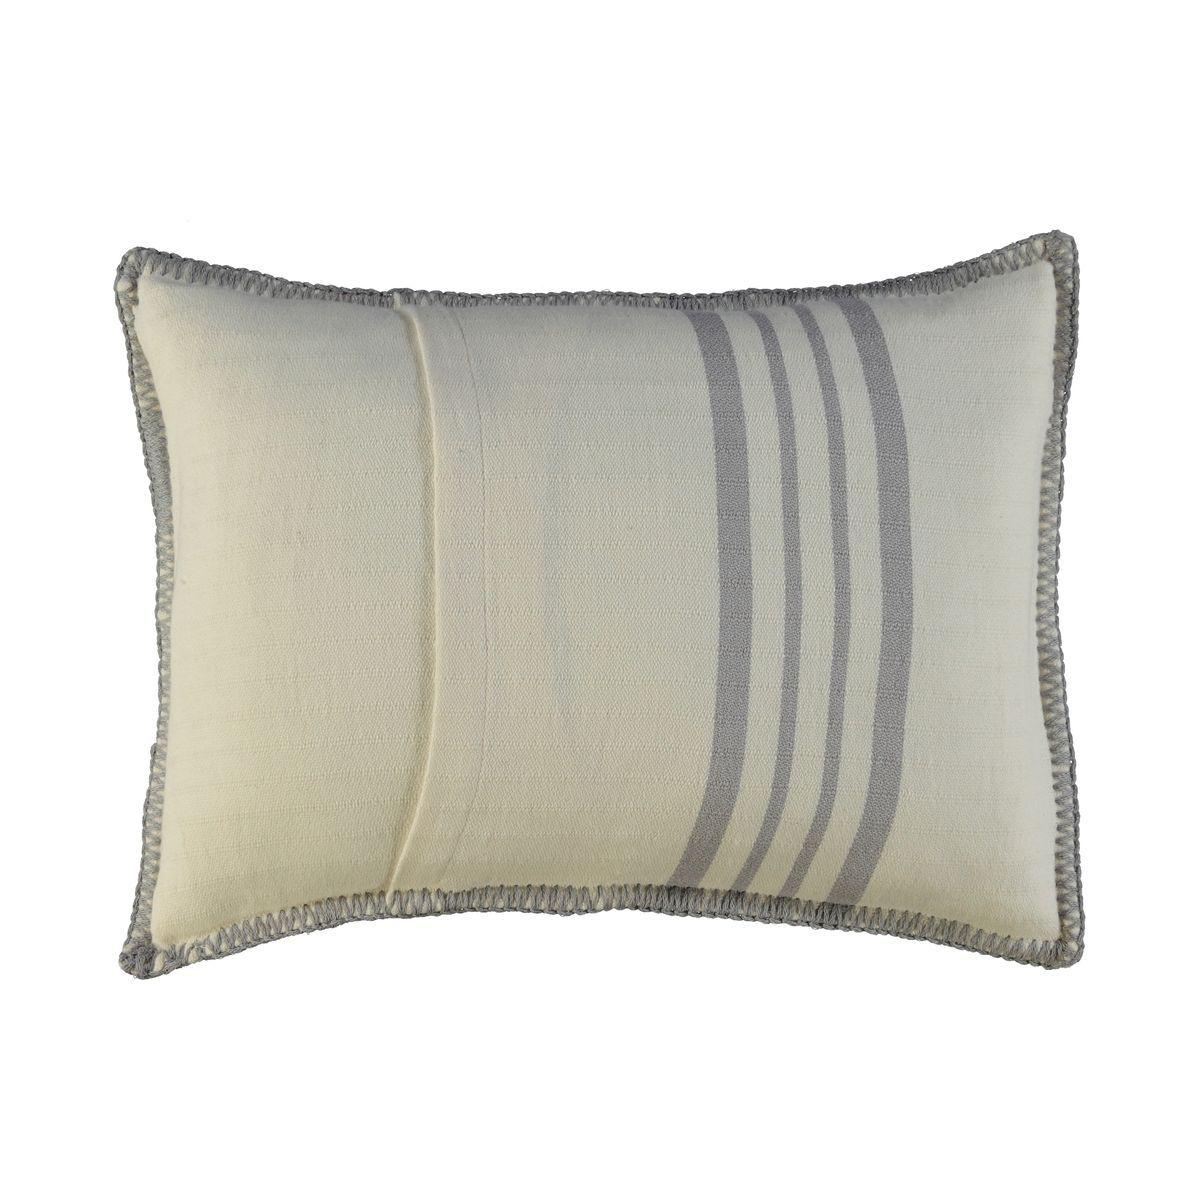 Cushion Cover Sultan - Light Grey Stripes / 30x40